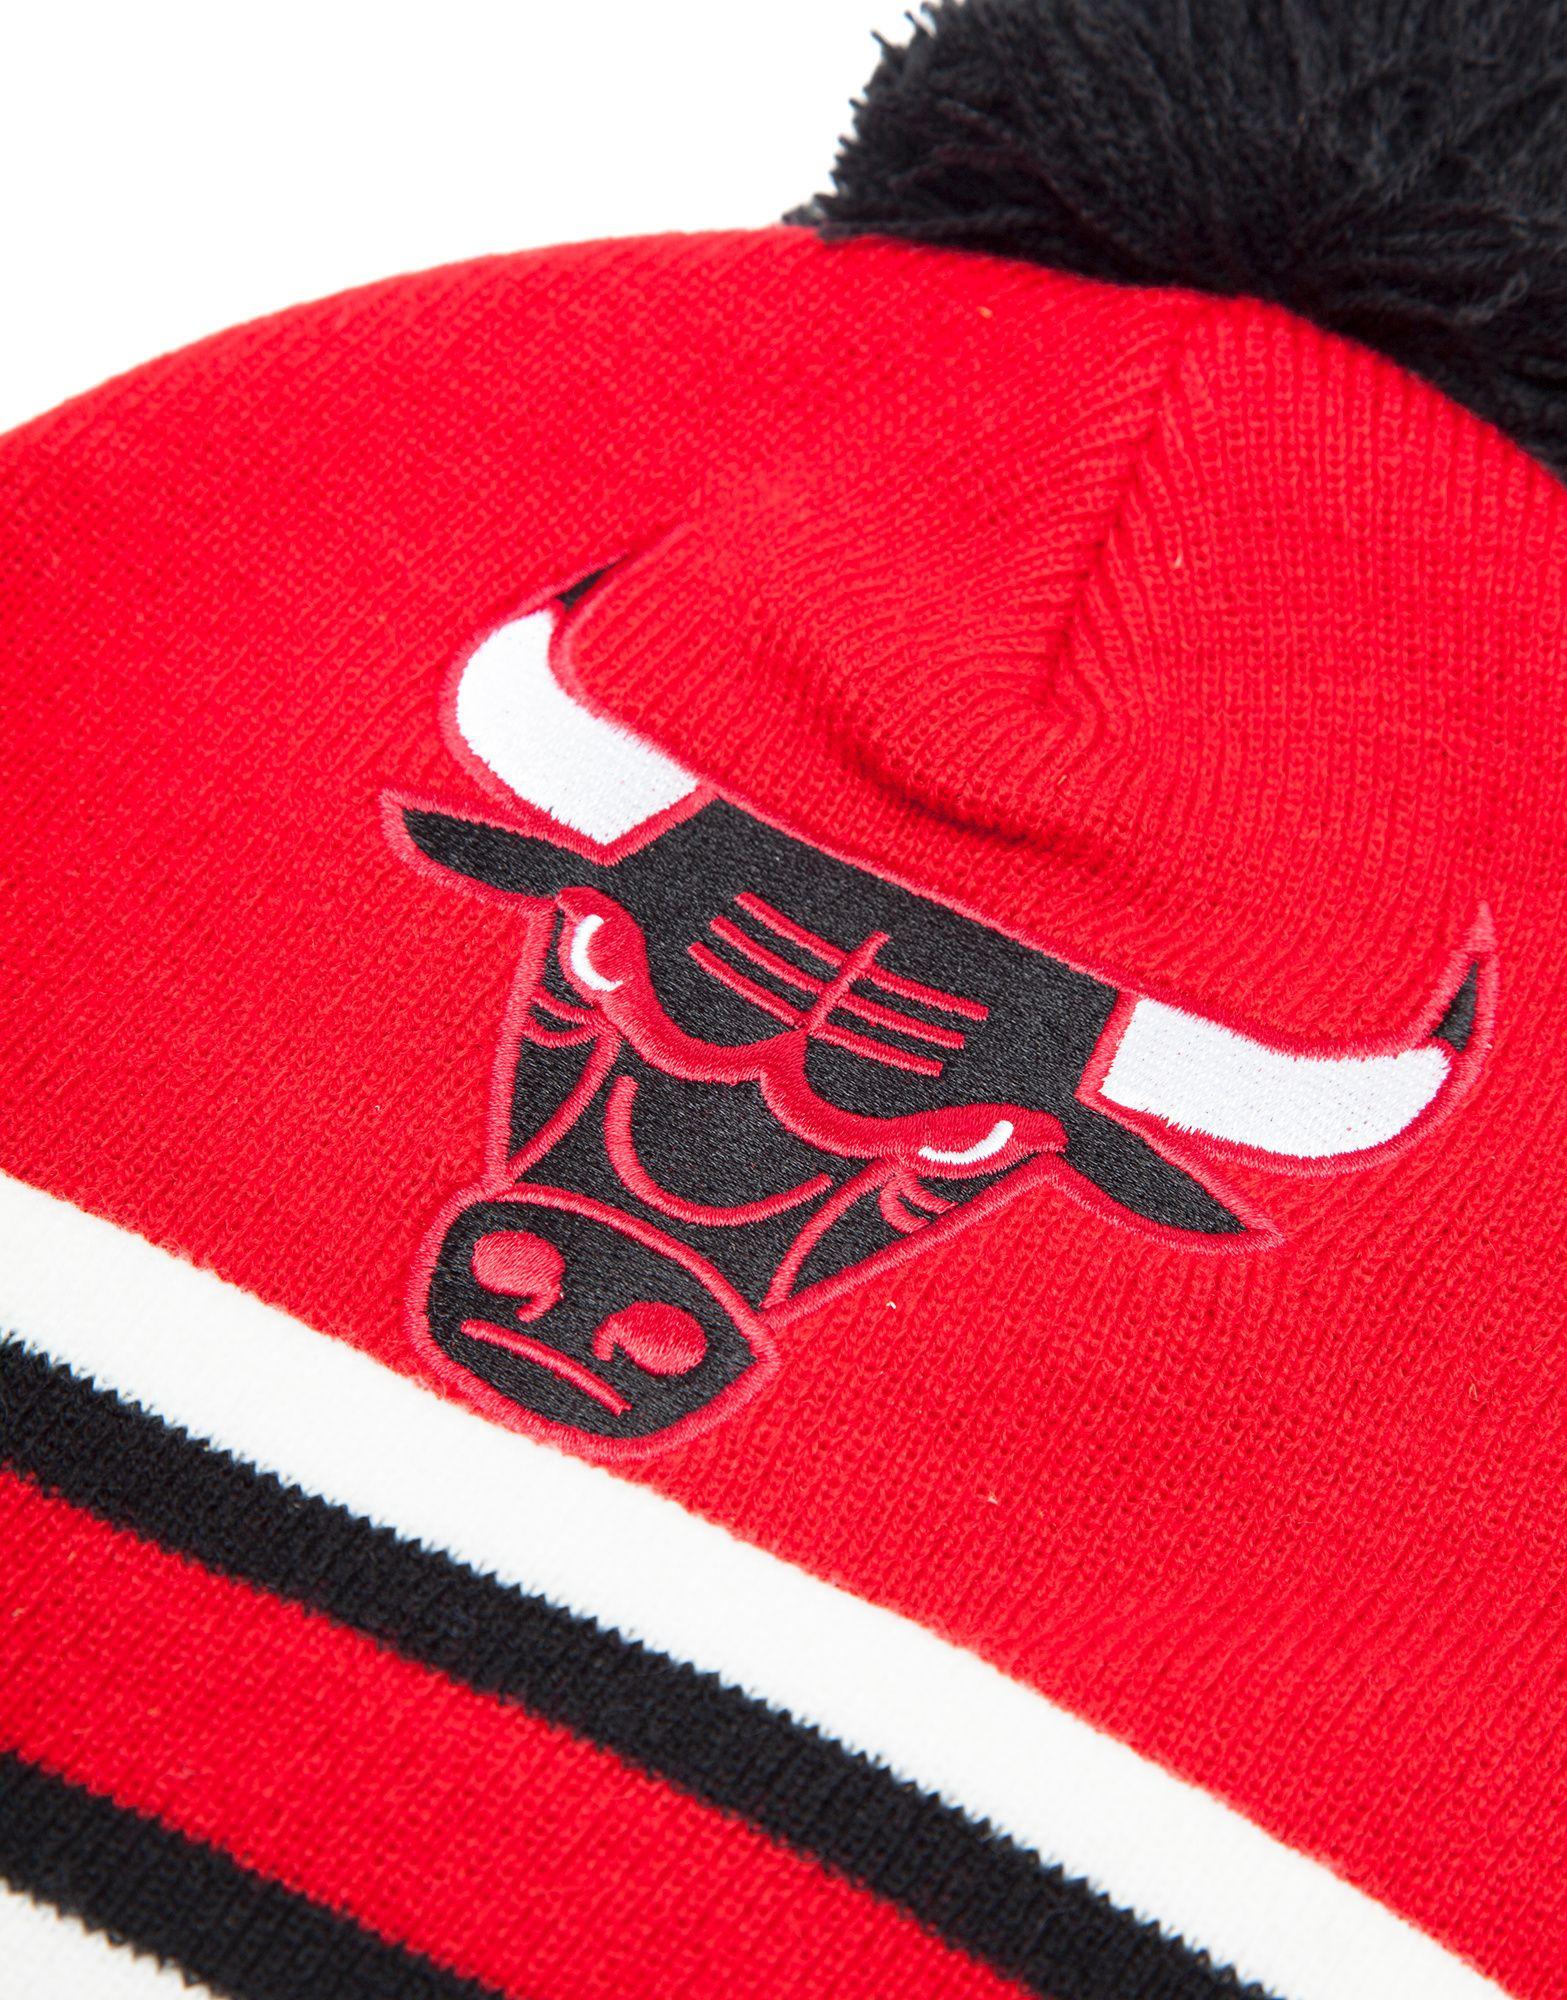 Mitchell & Ness NBA Chicago Bulls Bobble Hat